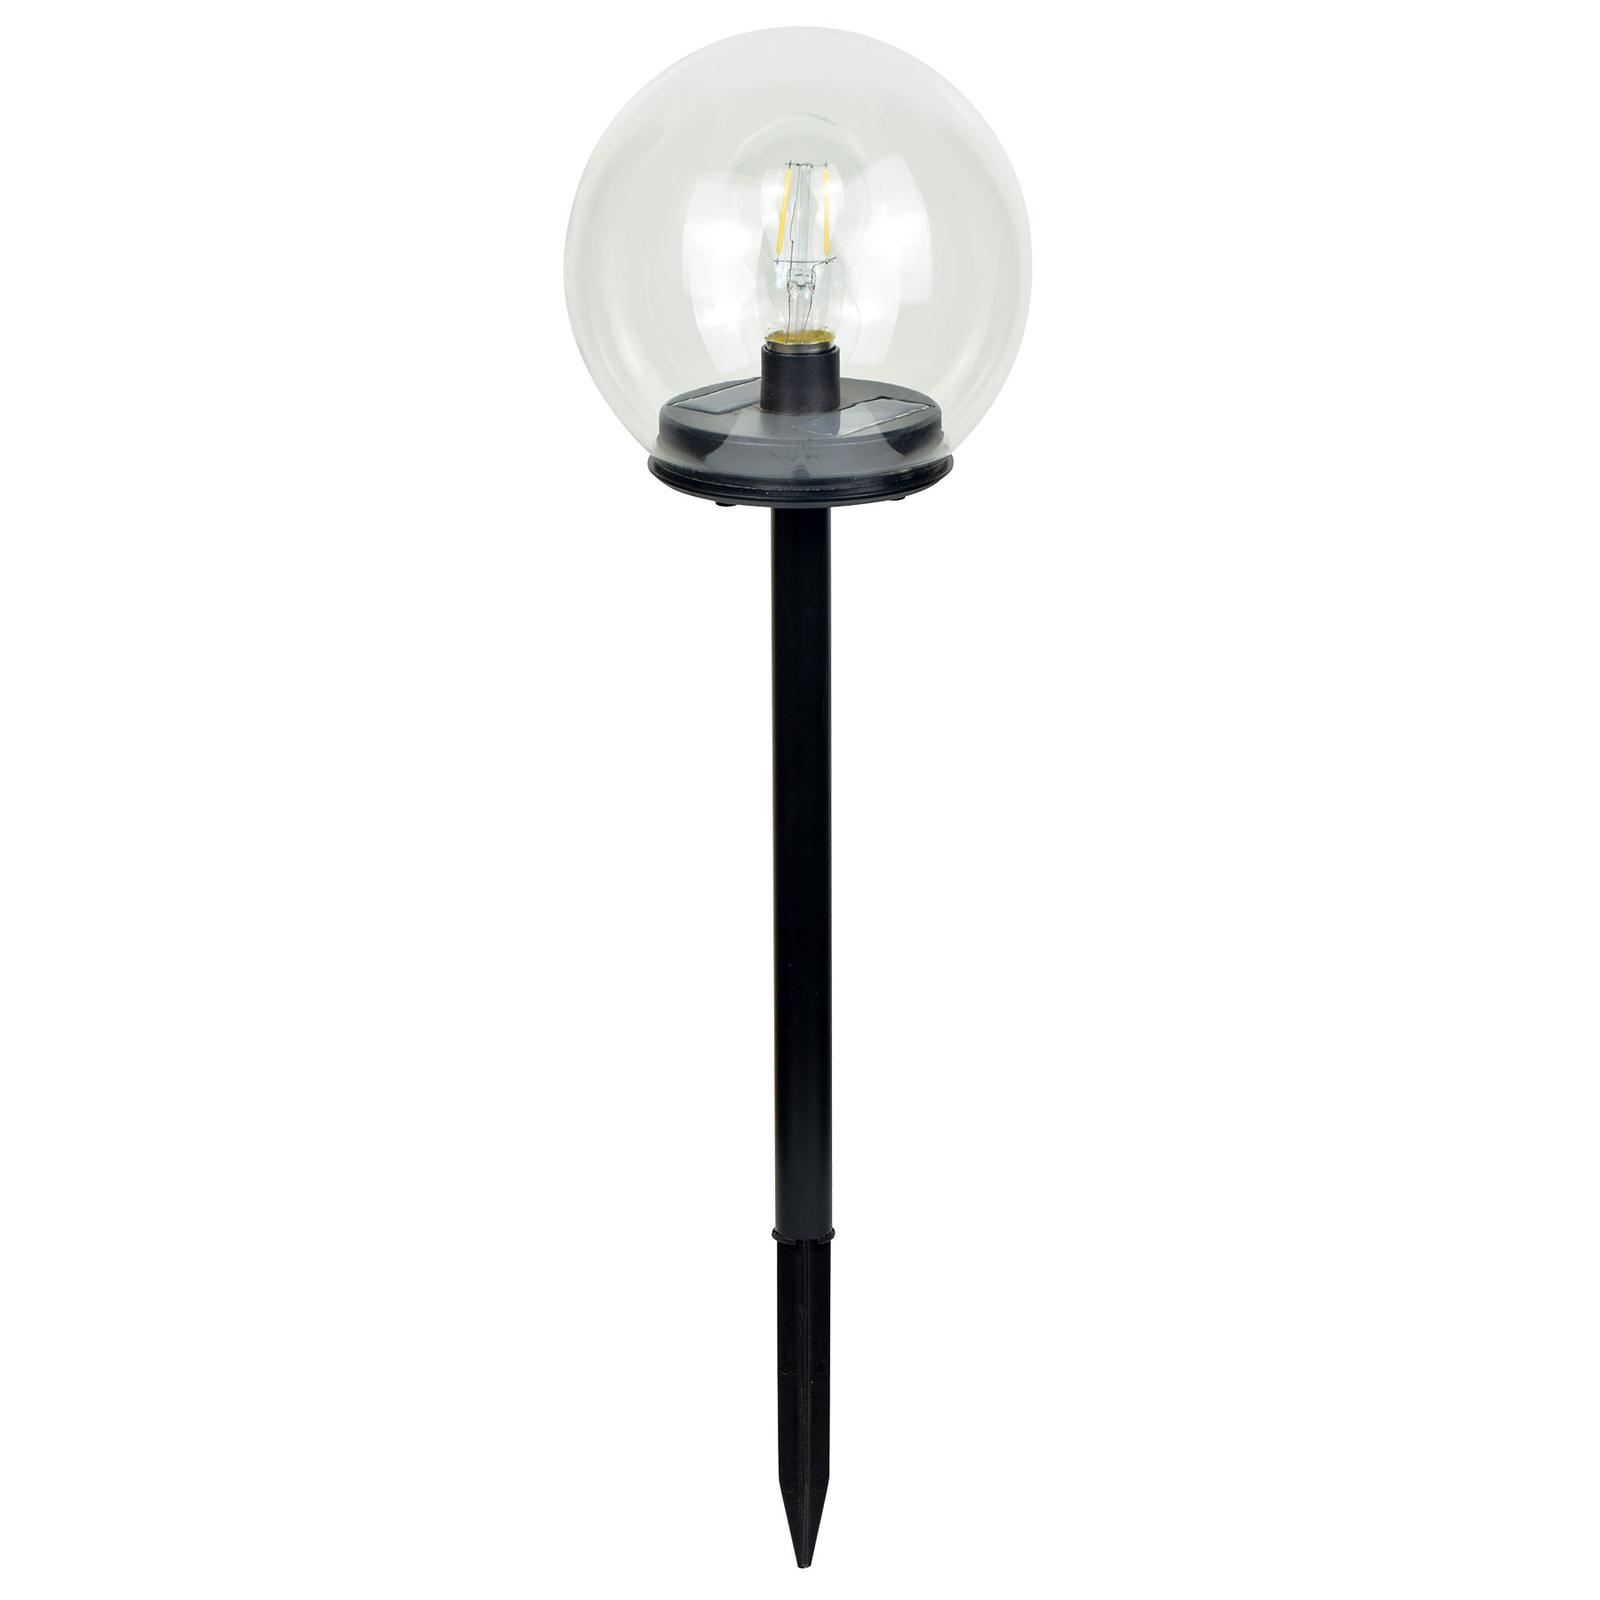 Lindby Roana LED solar light garden and table_8032333_1